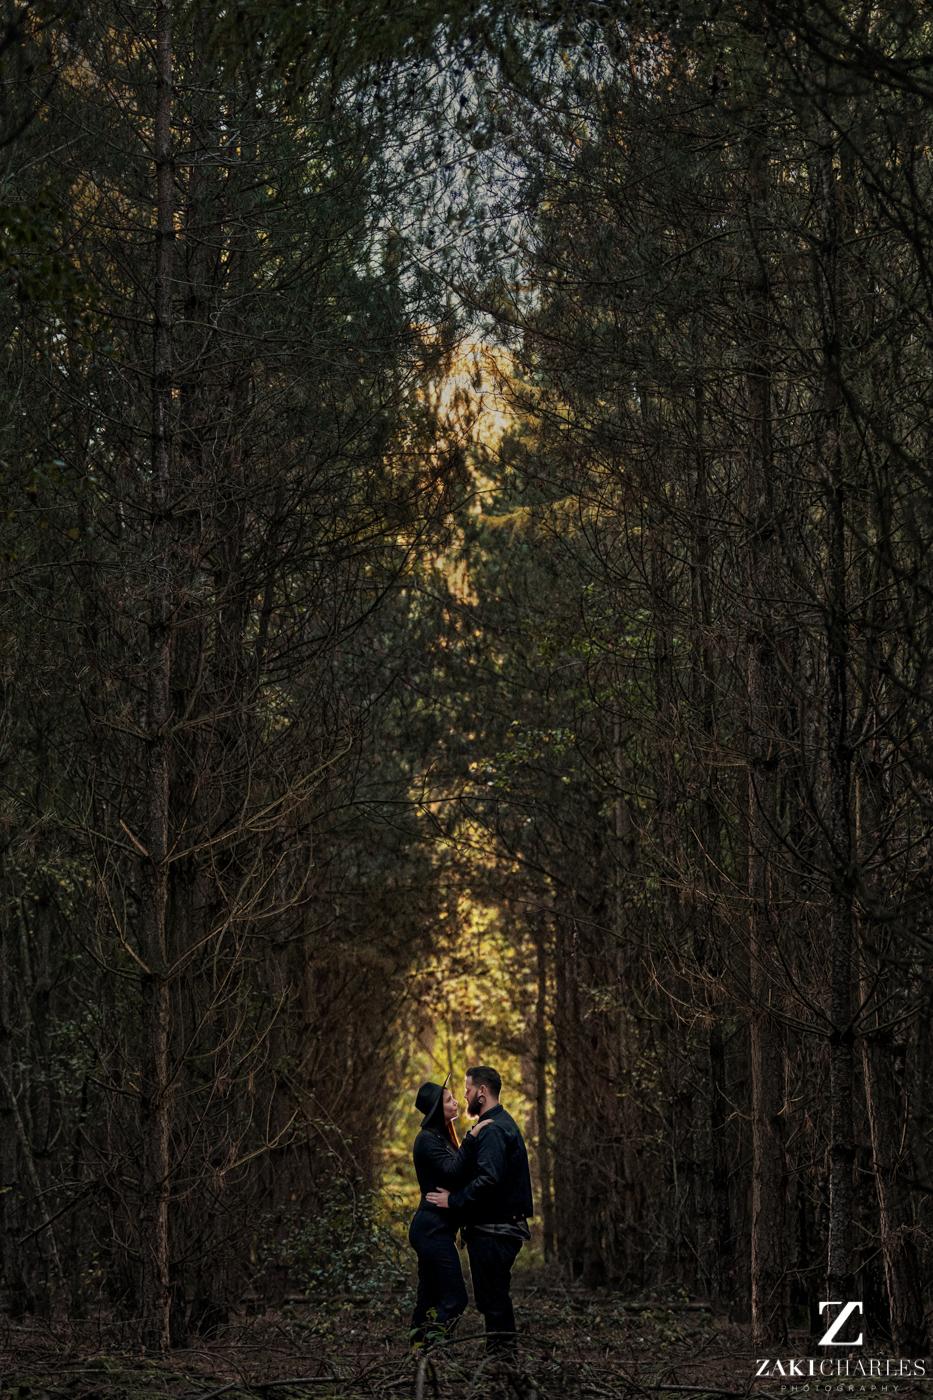 Black Park Engagement Session, Kirsty & Alex fine art photography 4